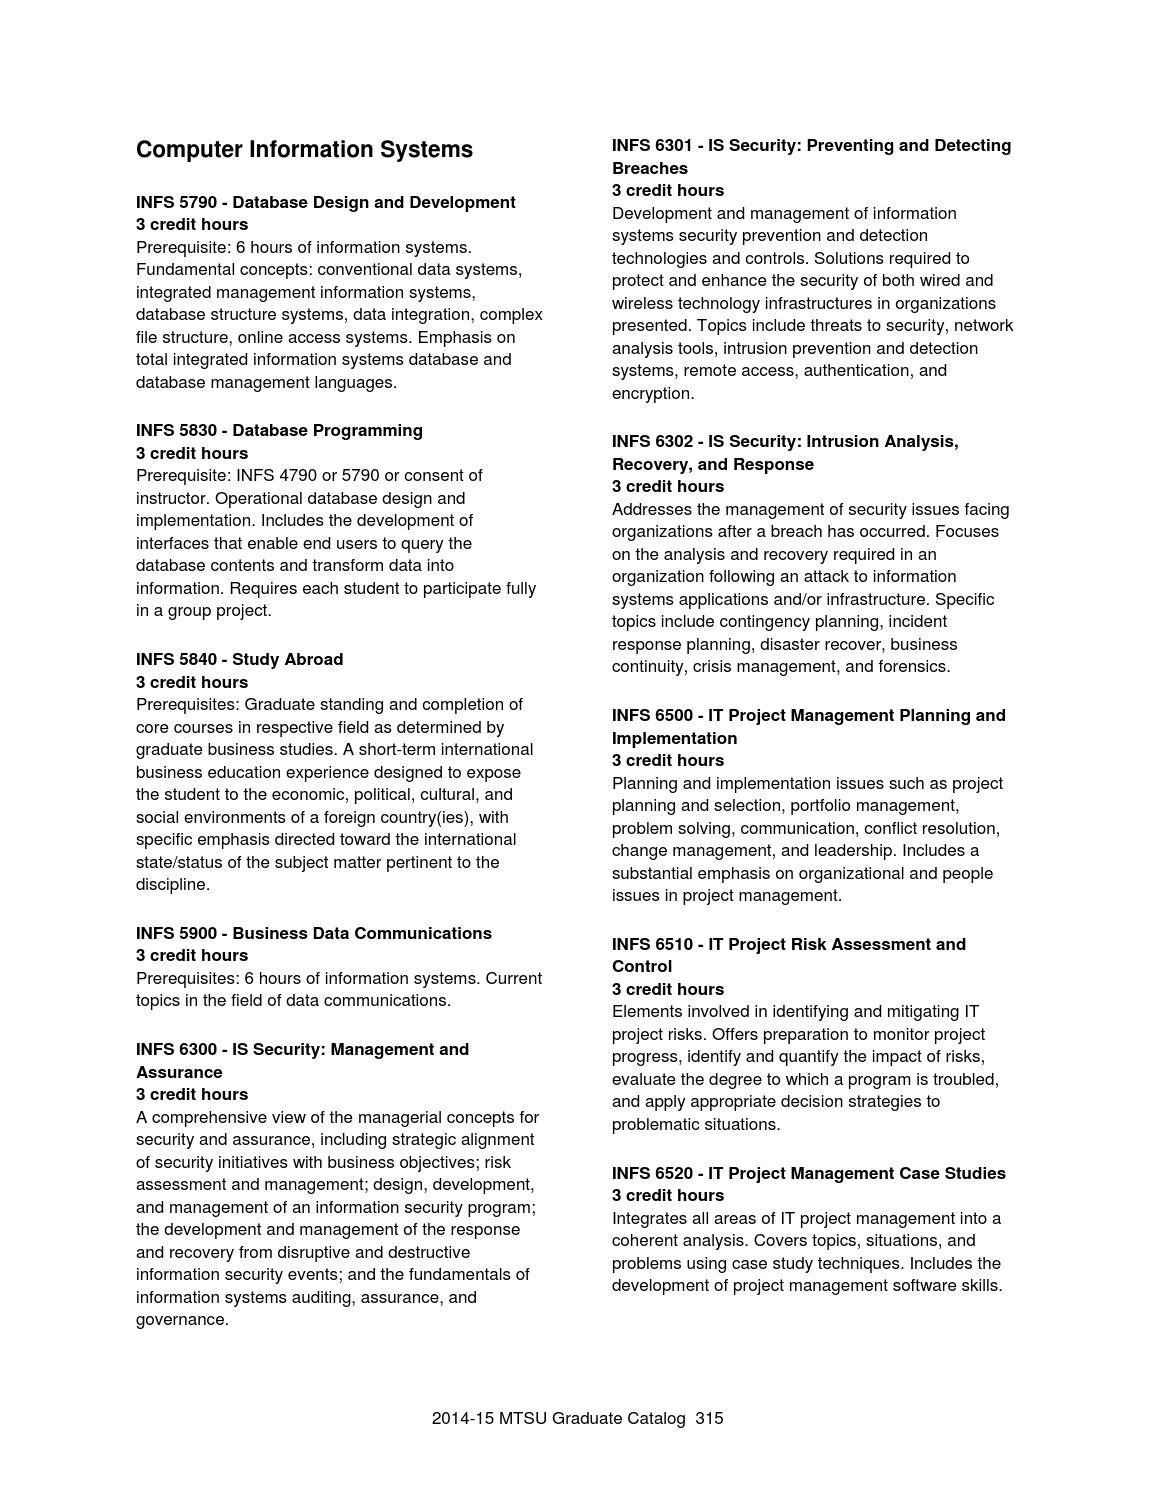 communication studies topics